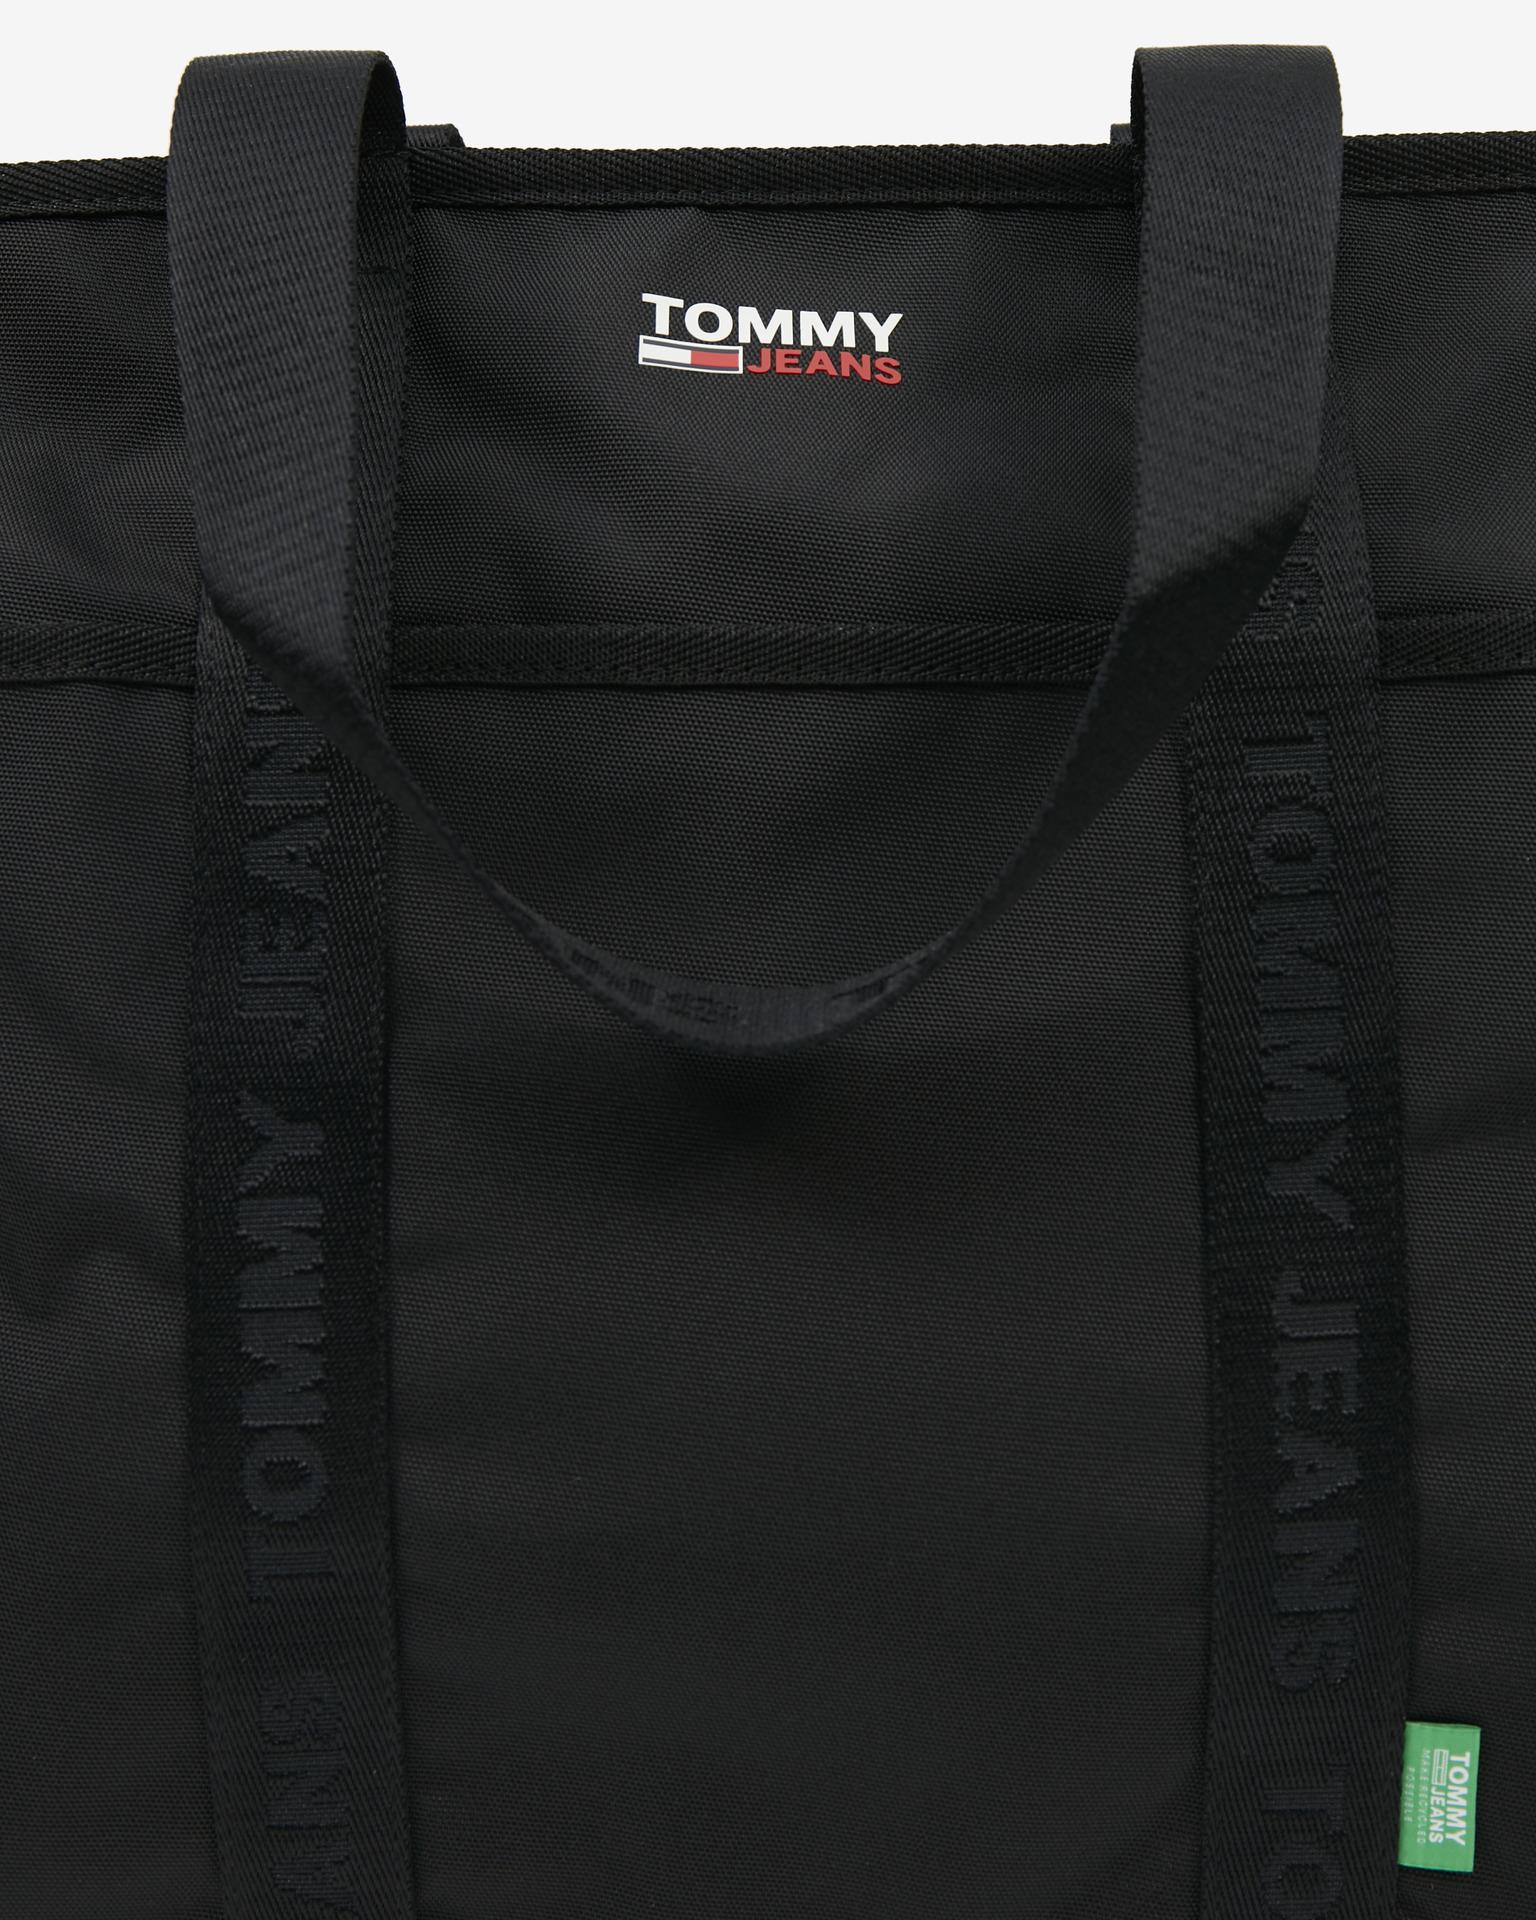 Borsa Tommy Jeans Campus nera